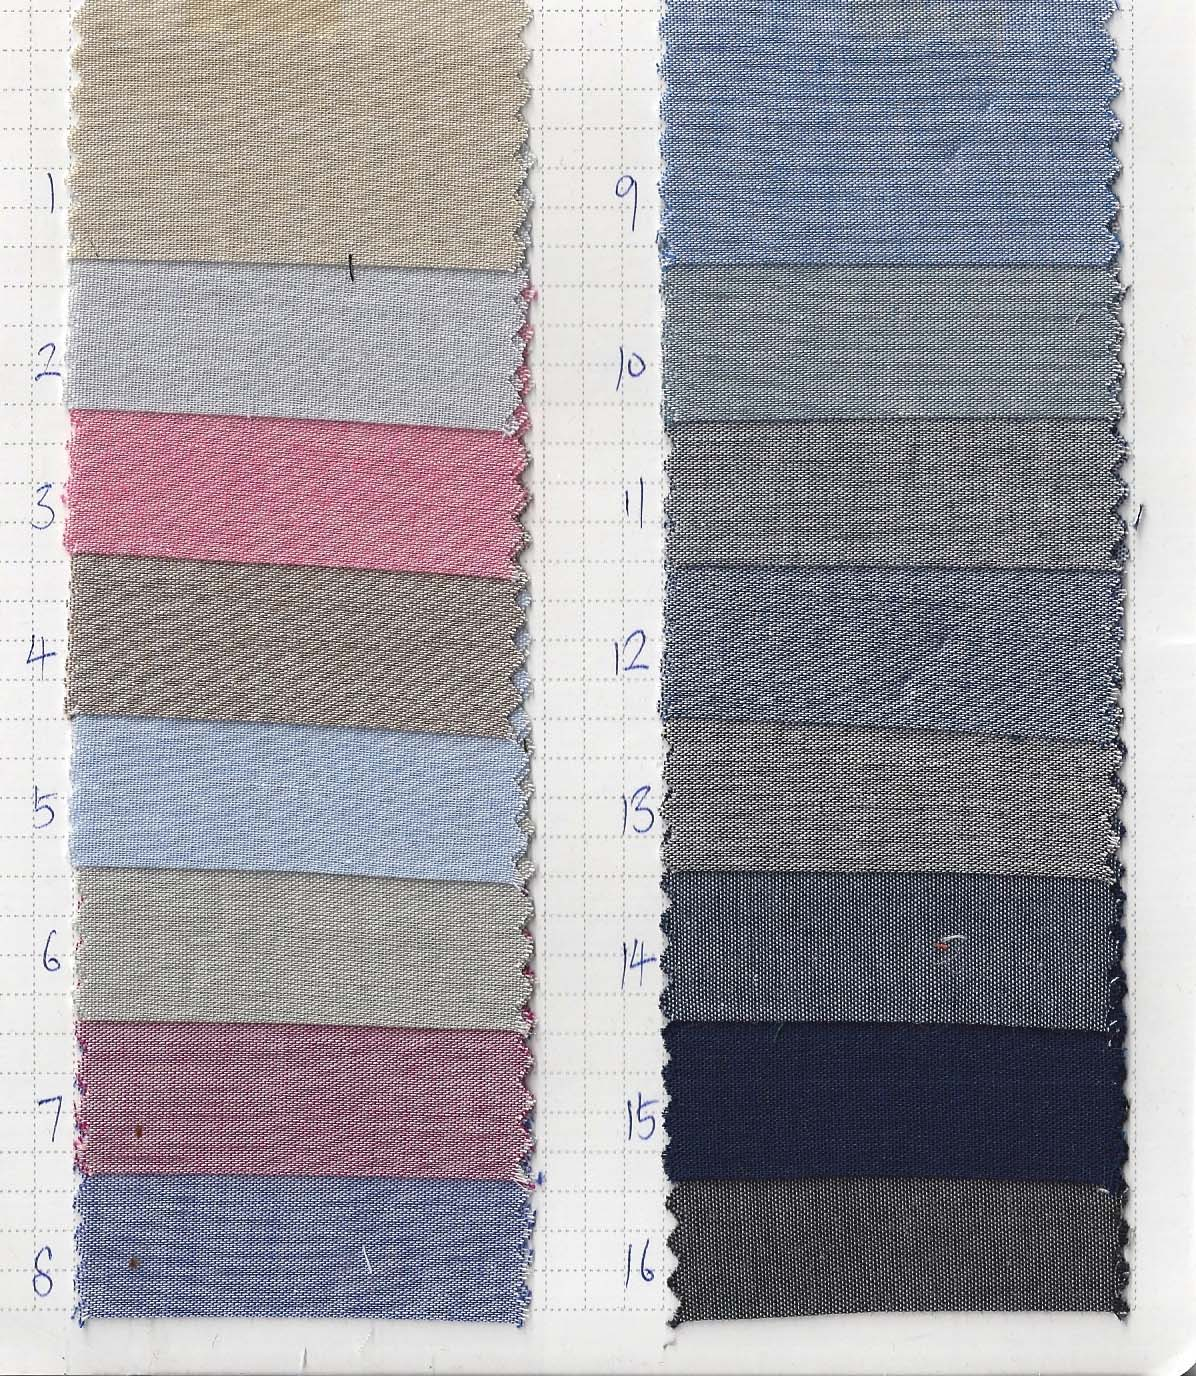 Sheng Ye Textile S574.jpg